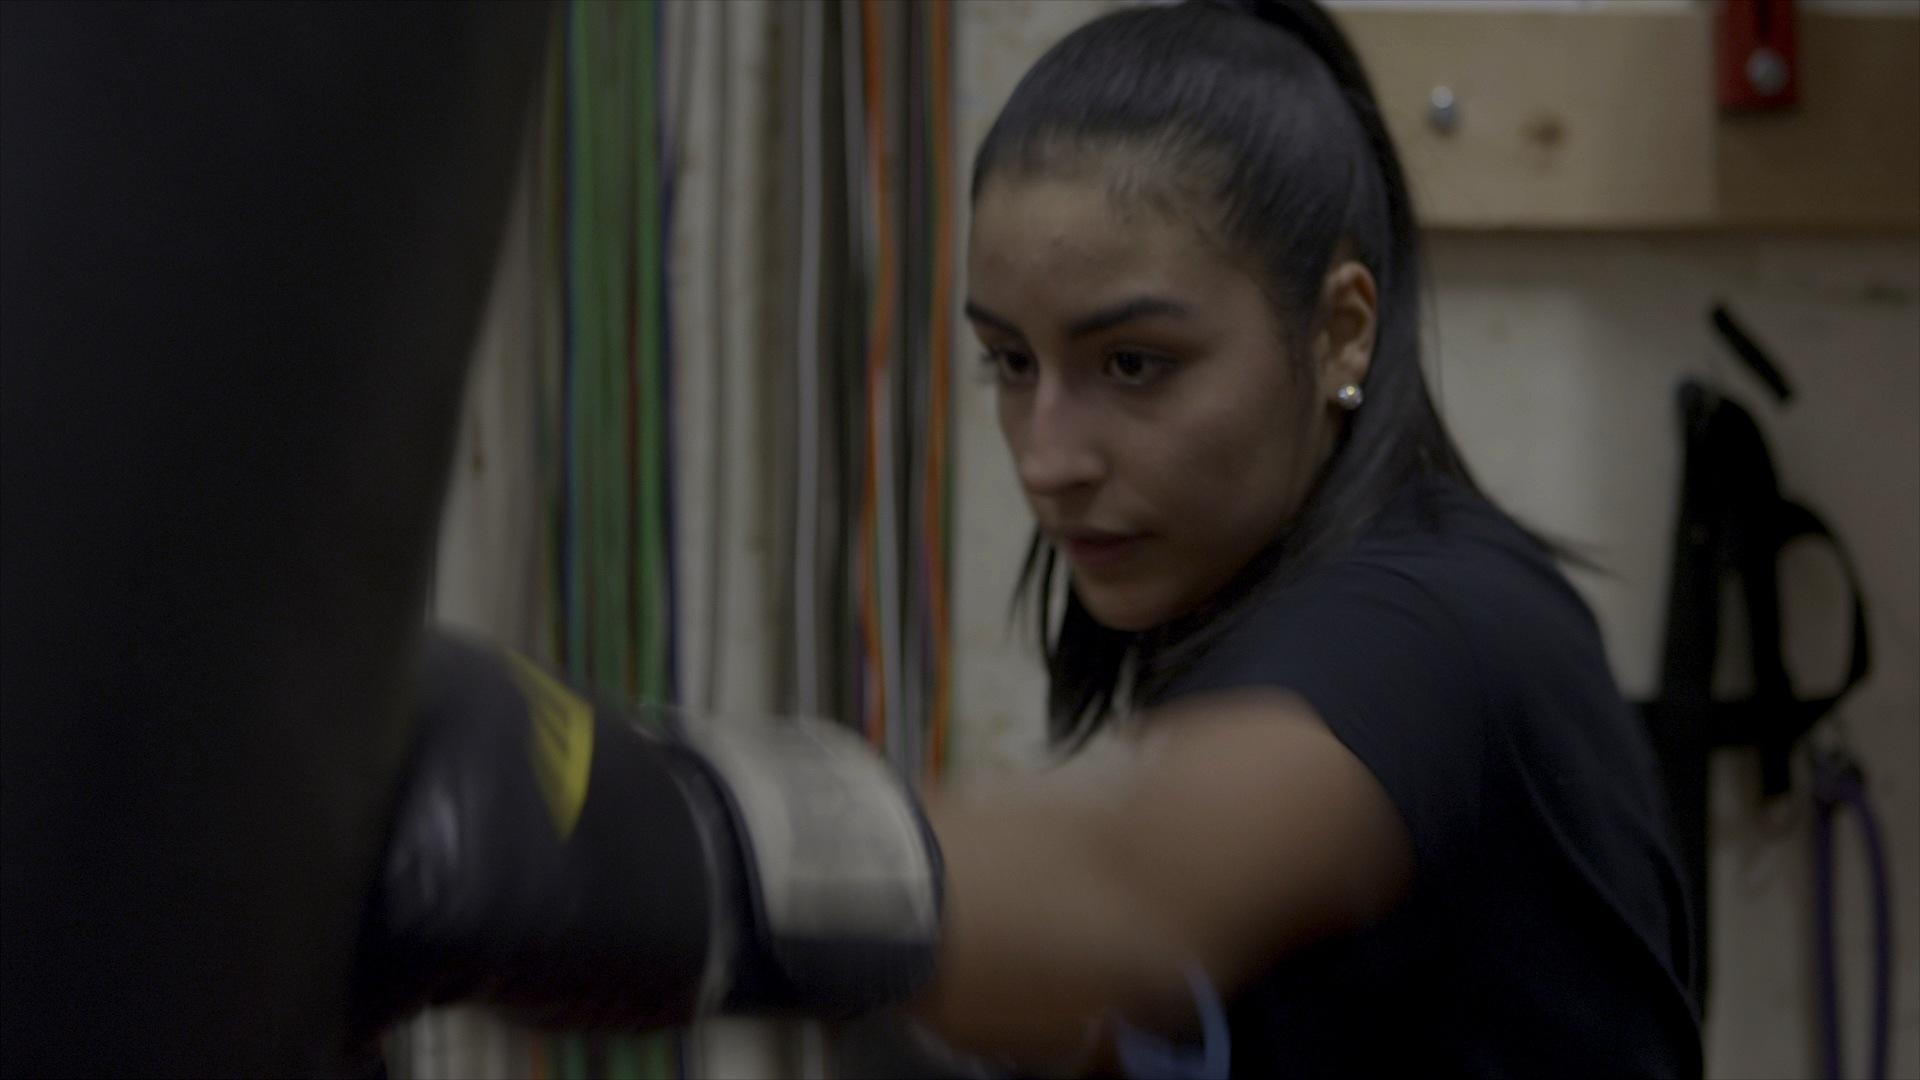 Karyna, 17 White Center PAL boxer